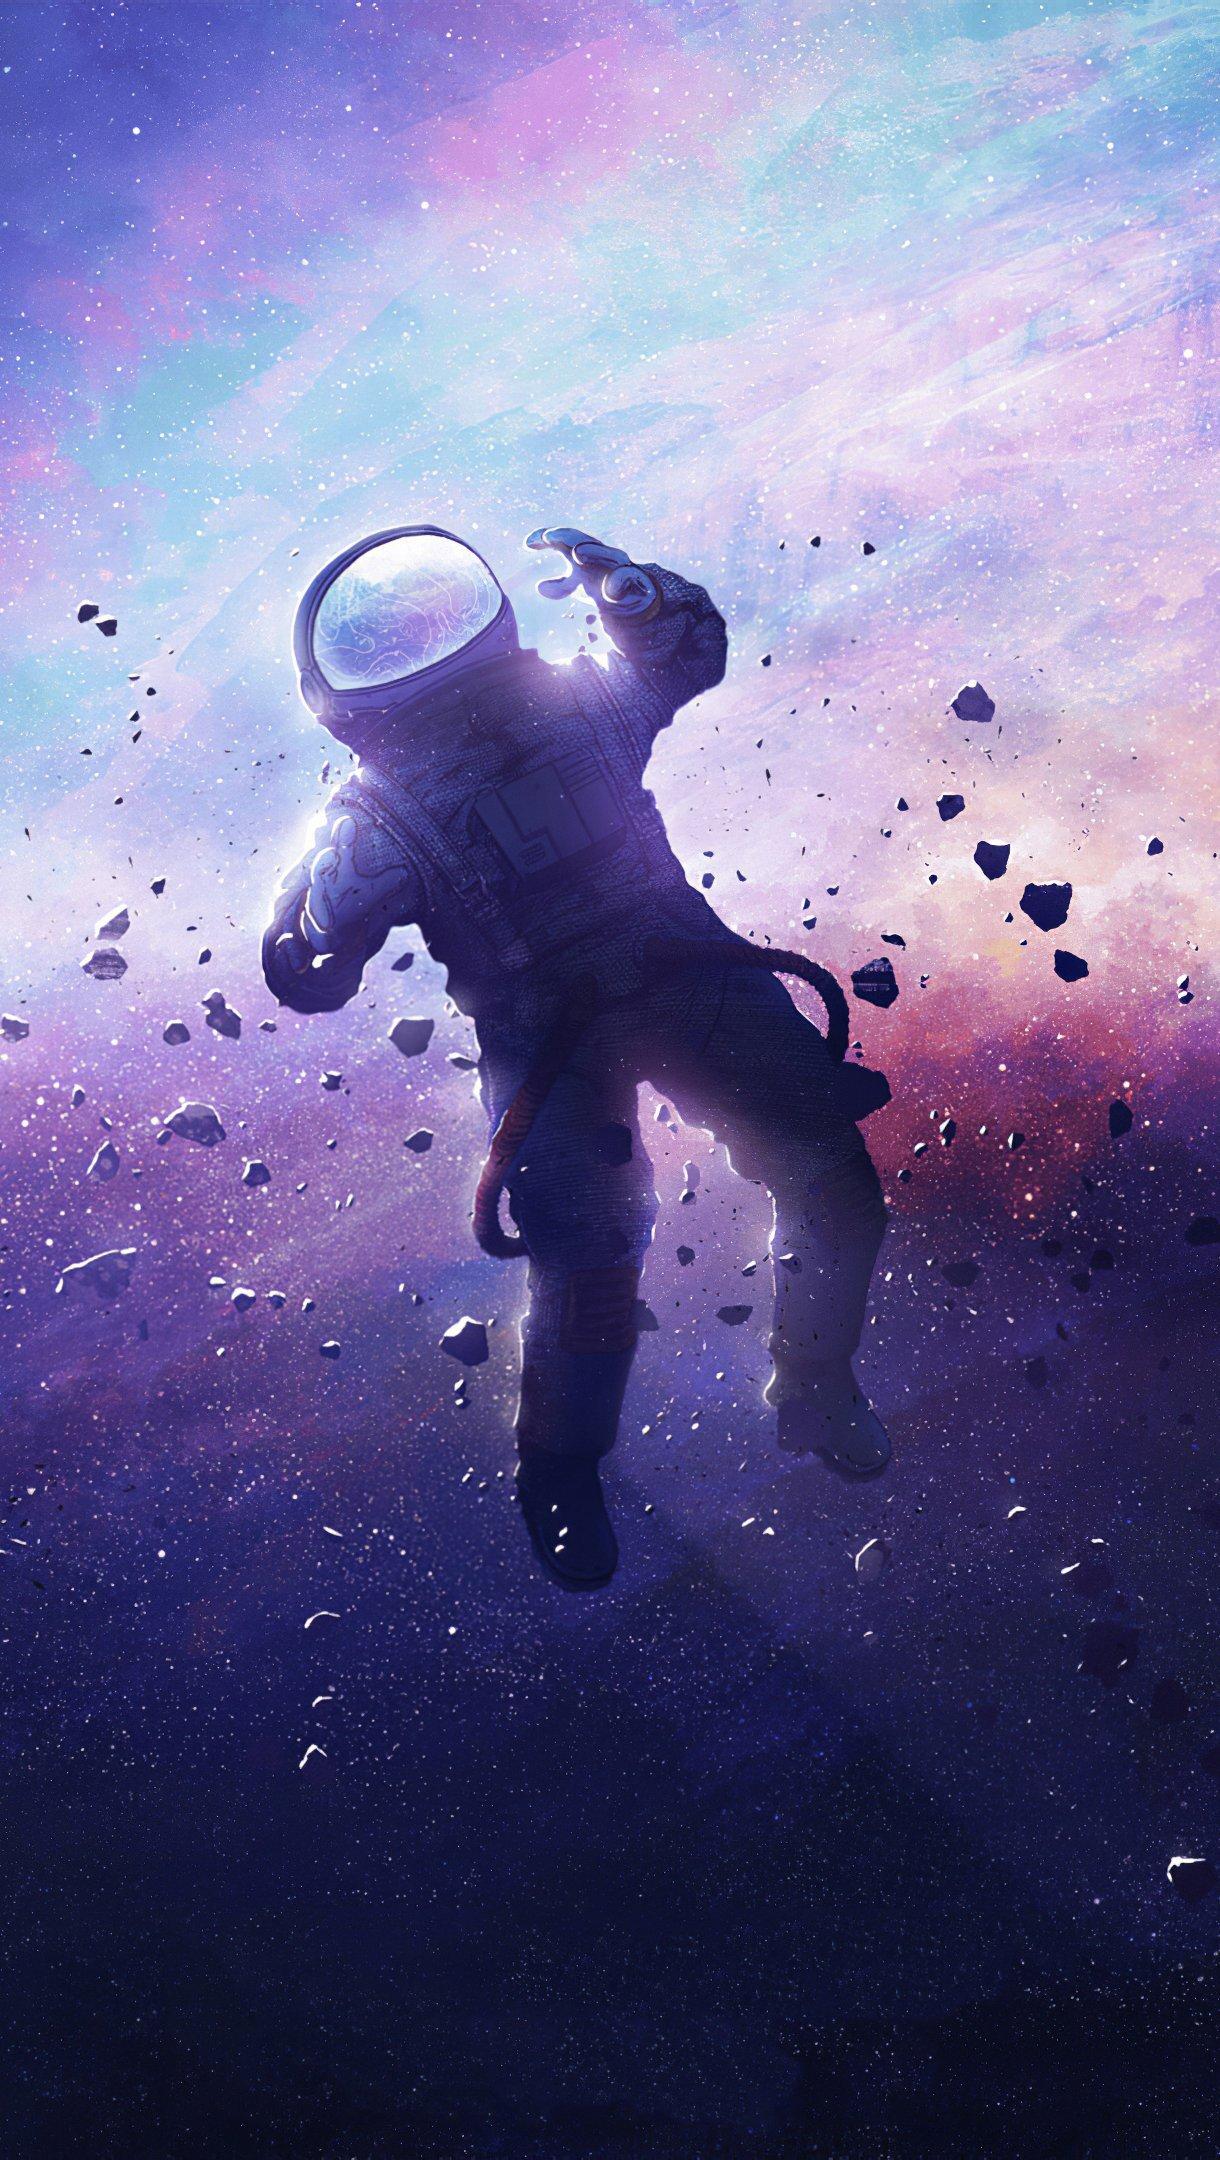 Wallpaper Astronaut lost in space Vertical